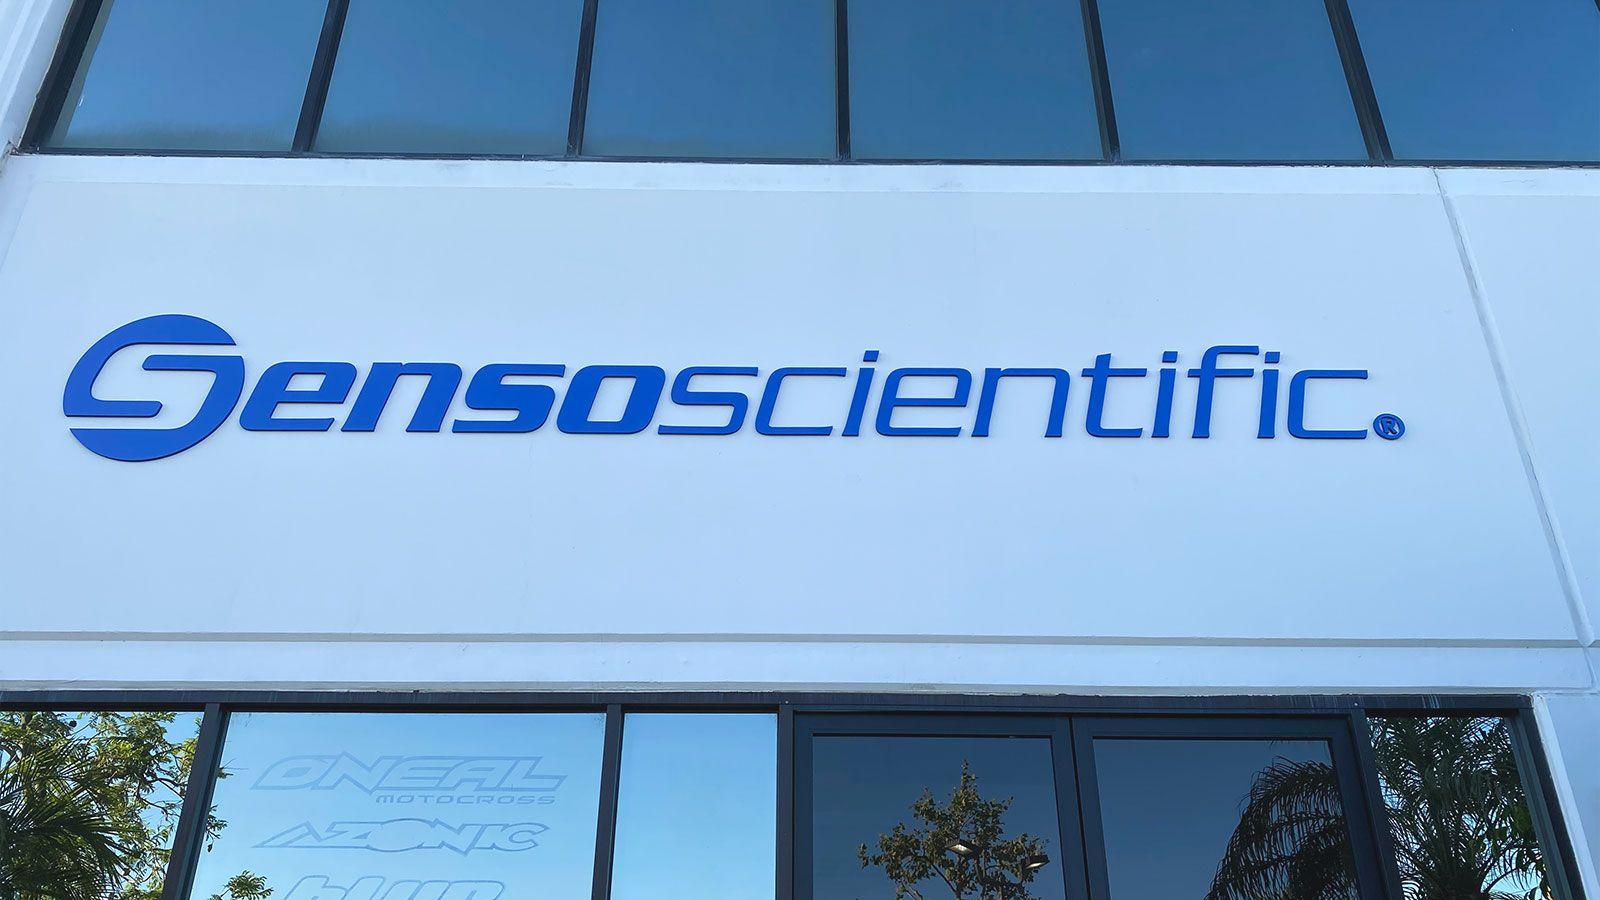 Sensoscientific outdoor sign